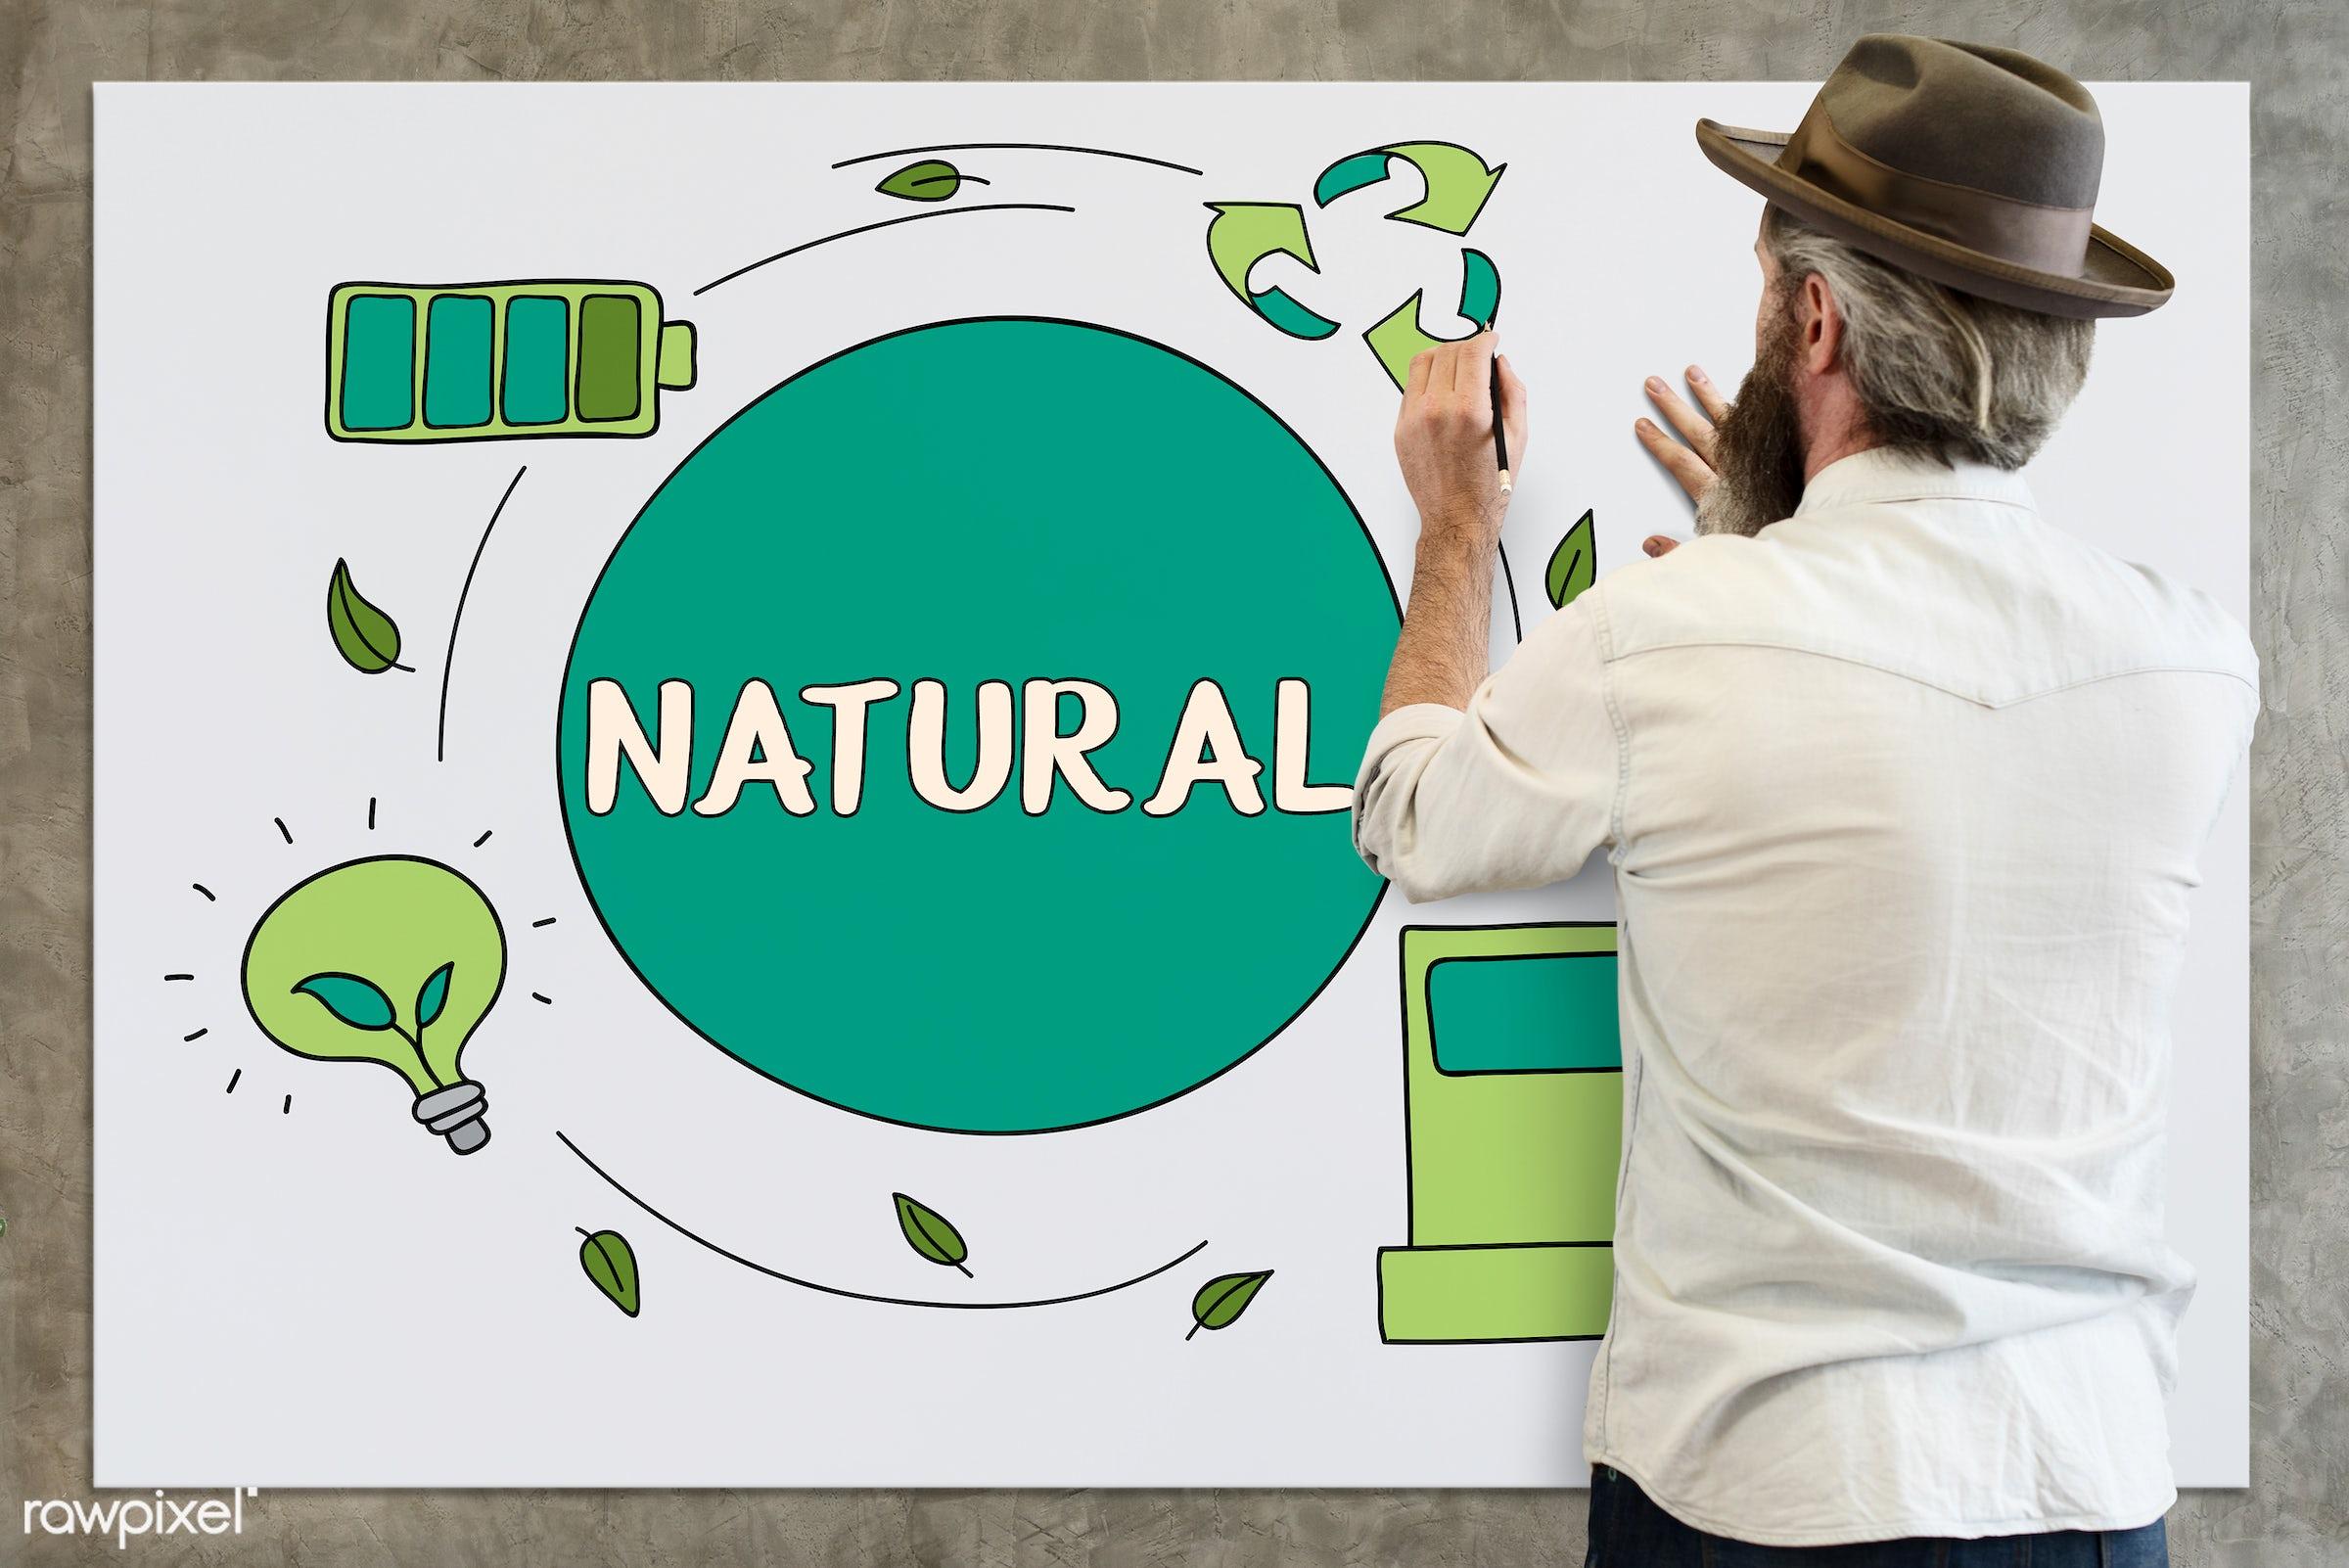 adult, alone, back, be creative, beard, beard guy, board, carefree, casual, chill, conservation, create, creative,...